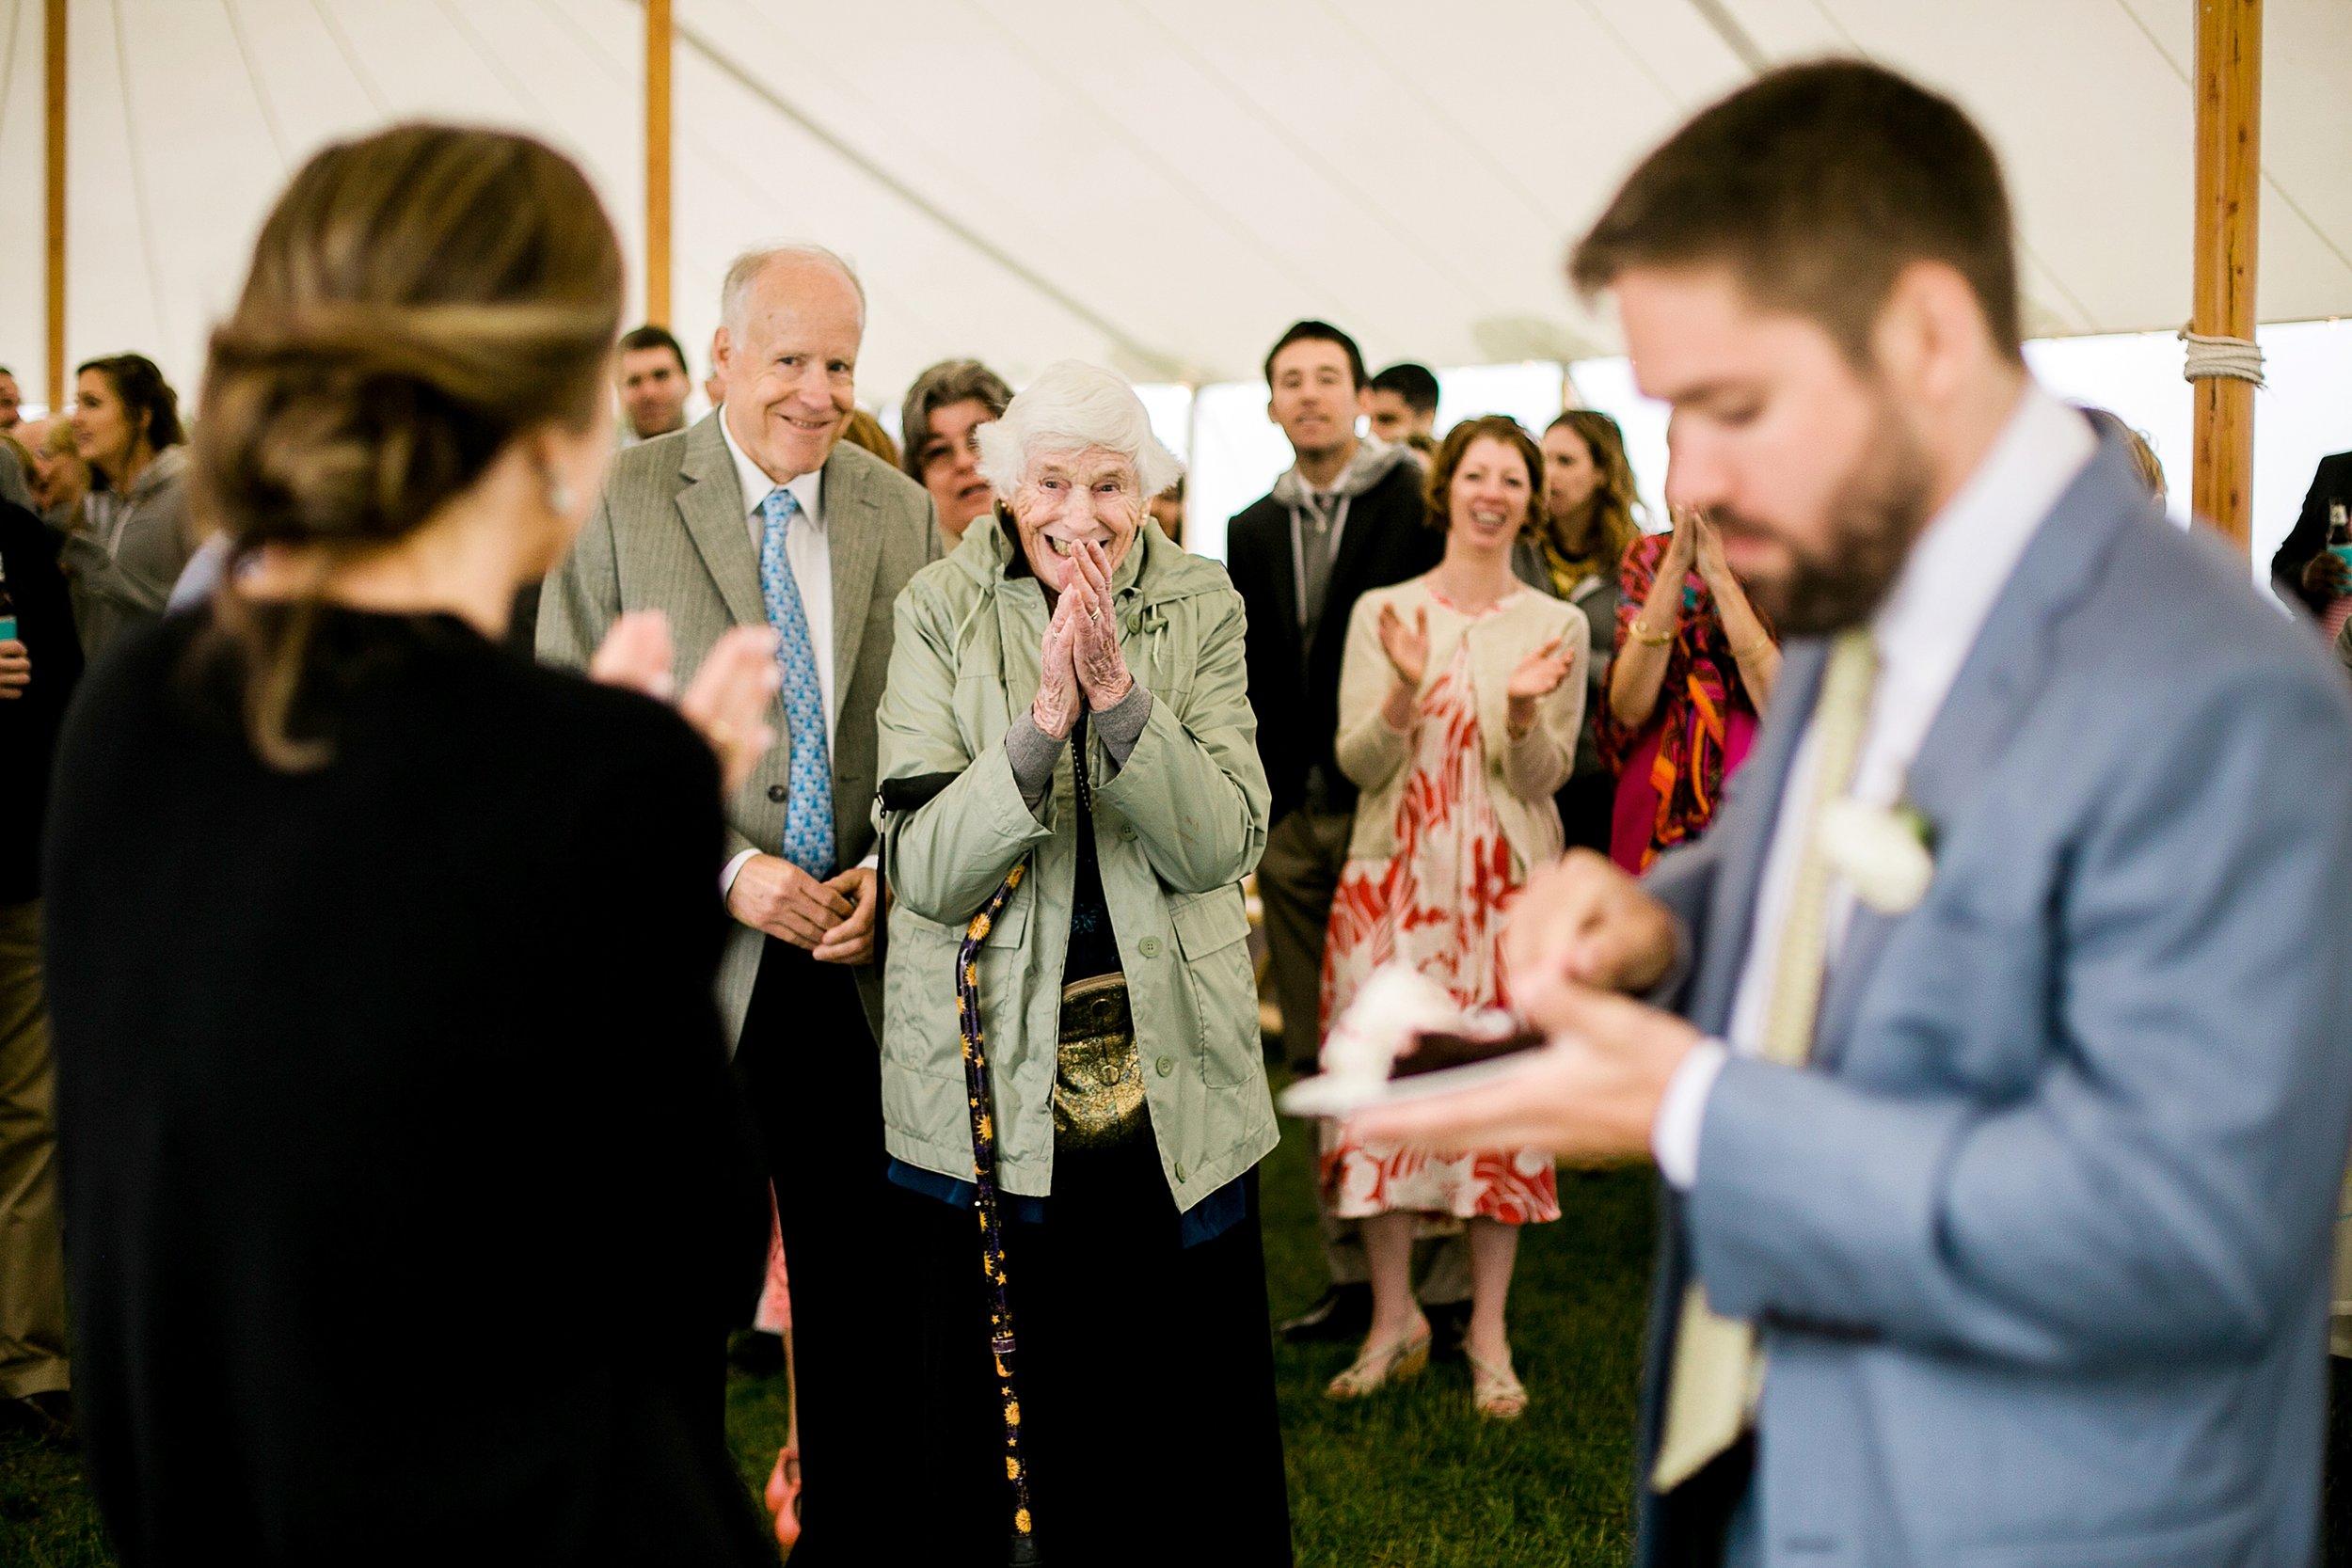 062 los angeles wedding photographer todd danforth photography cape cod.jpg